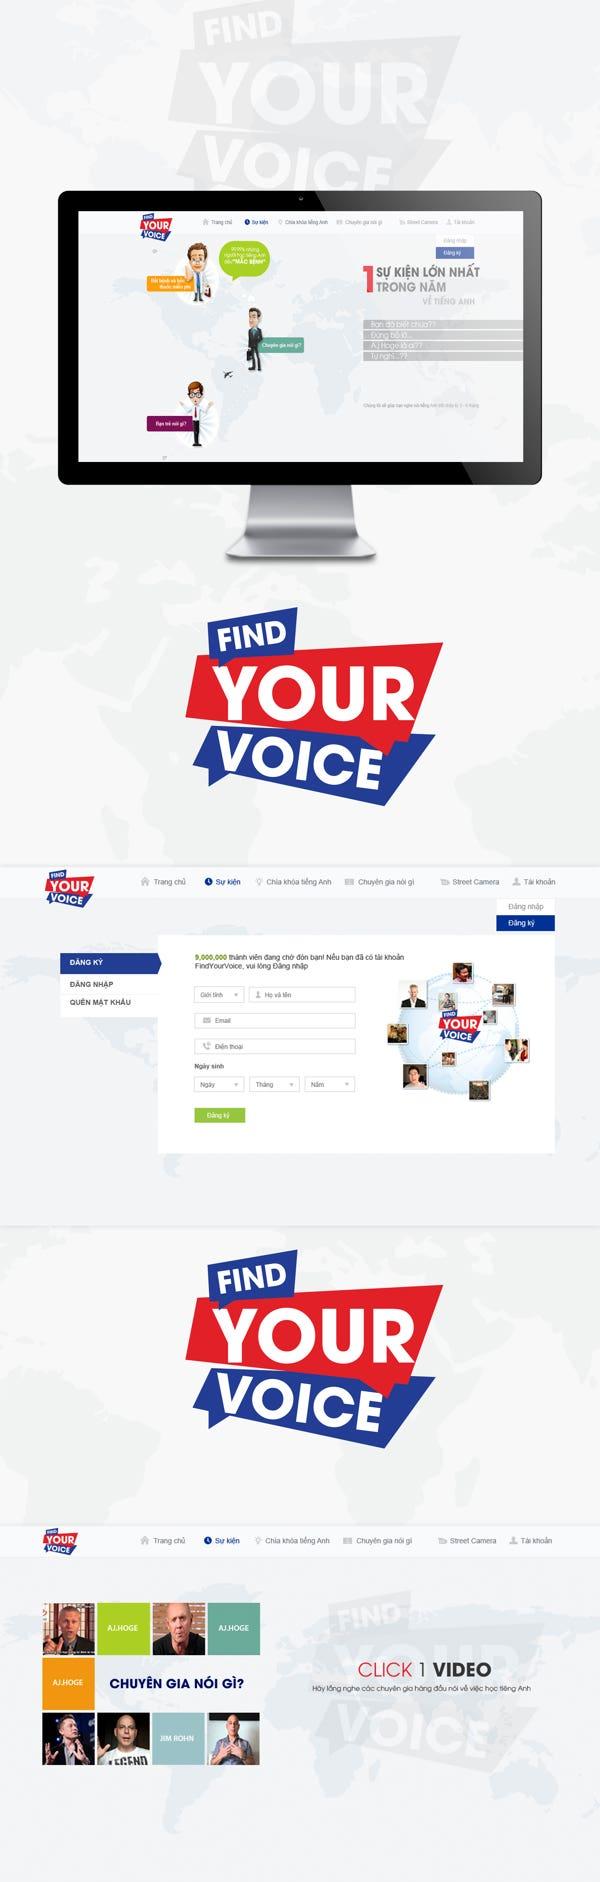 www.findyourvoice.com